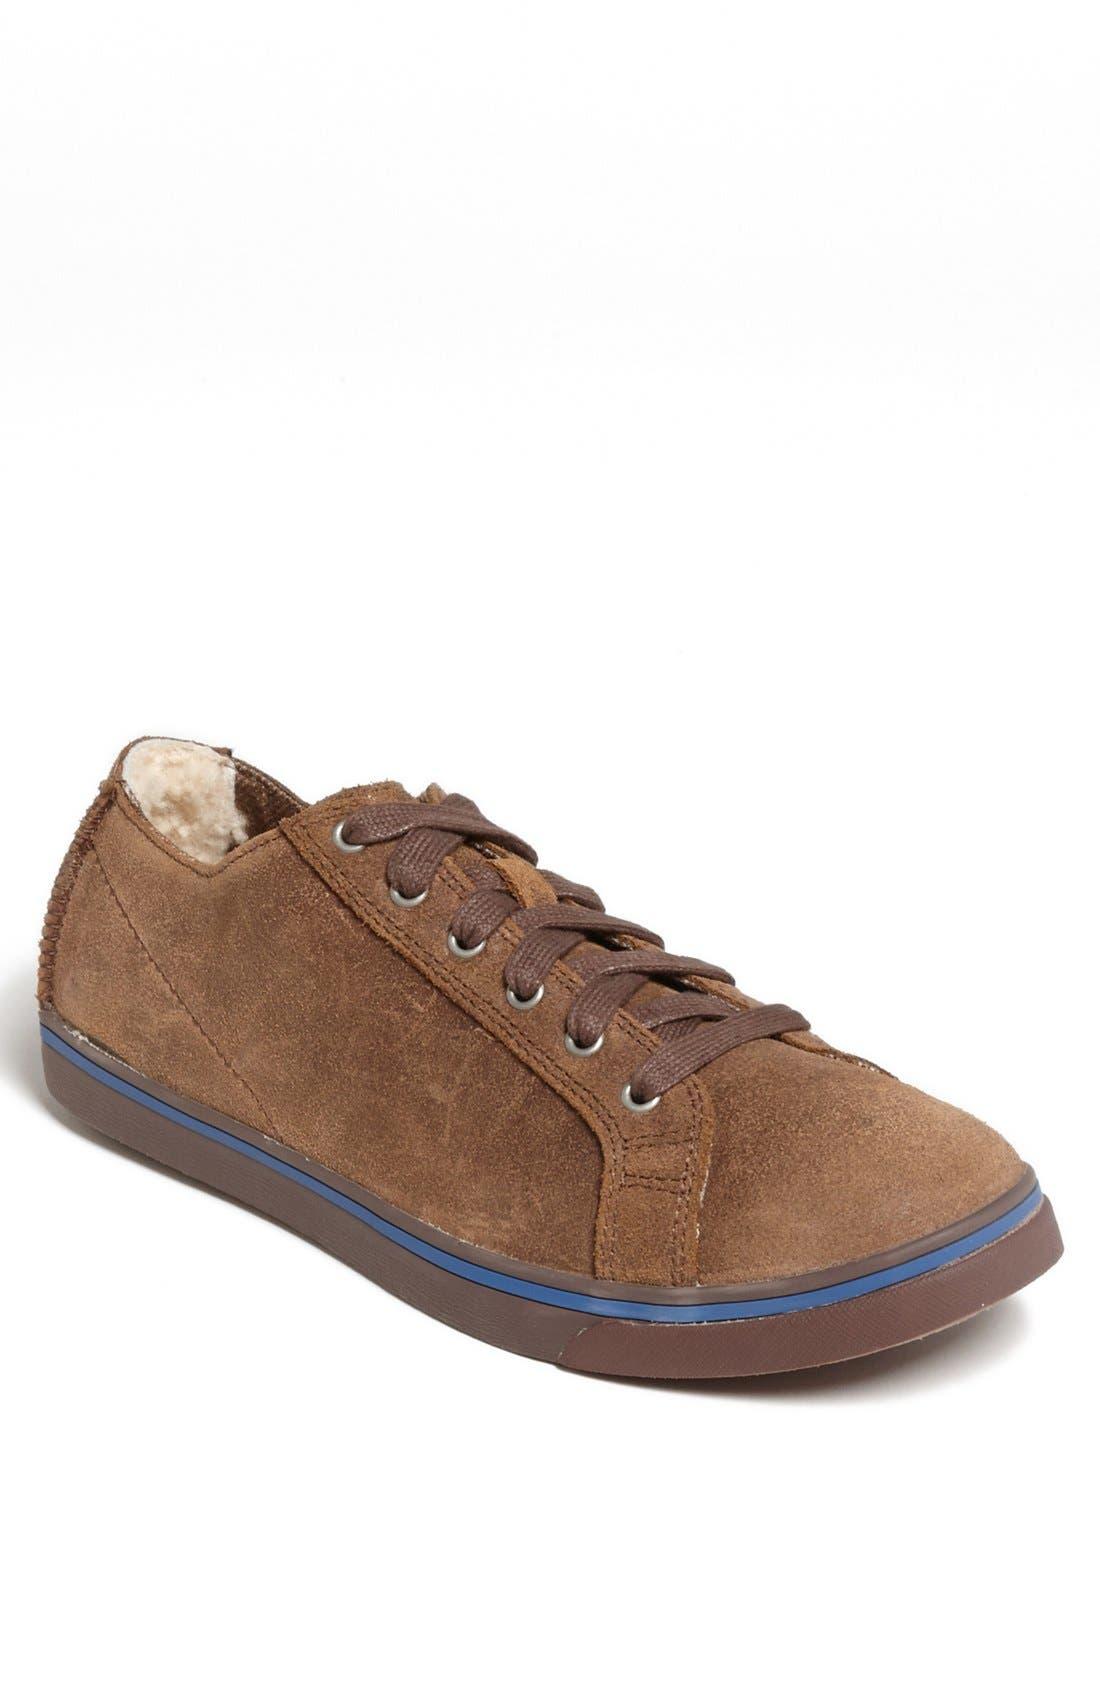 Australia 'Vanowen' Sneaker,                             Main thumbnail 2, color,